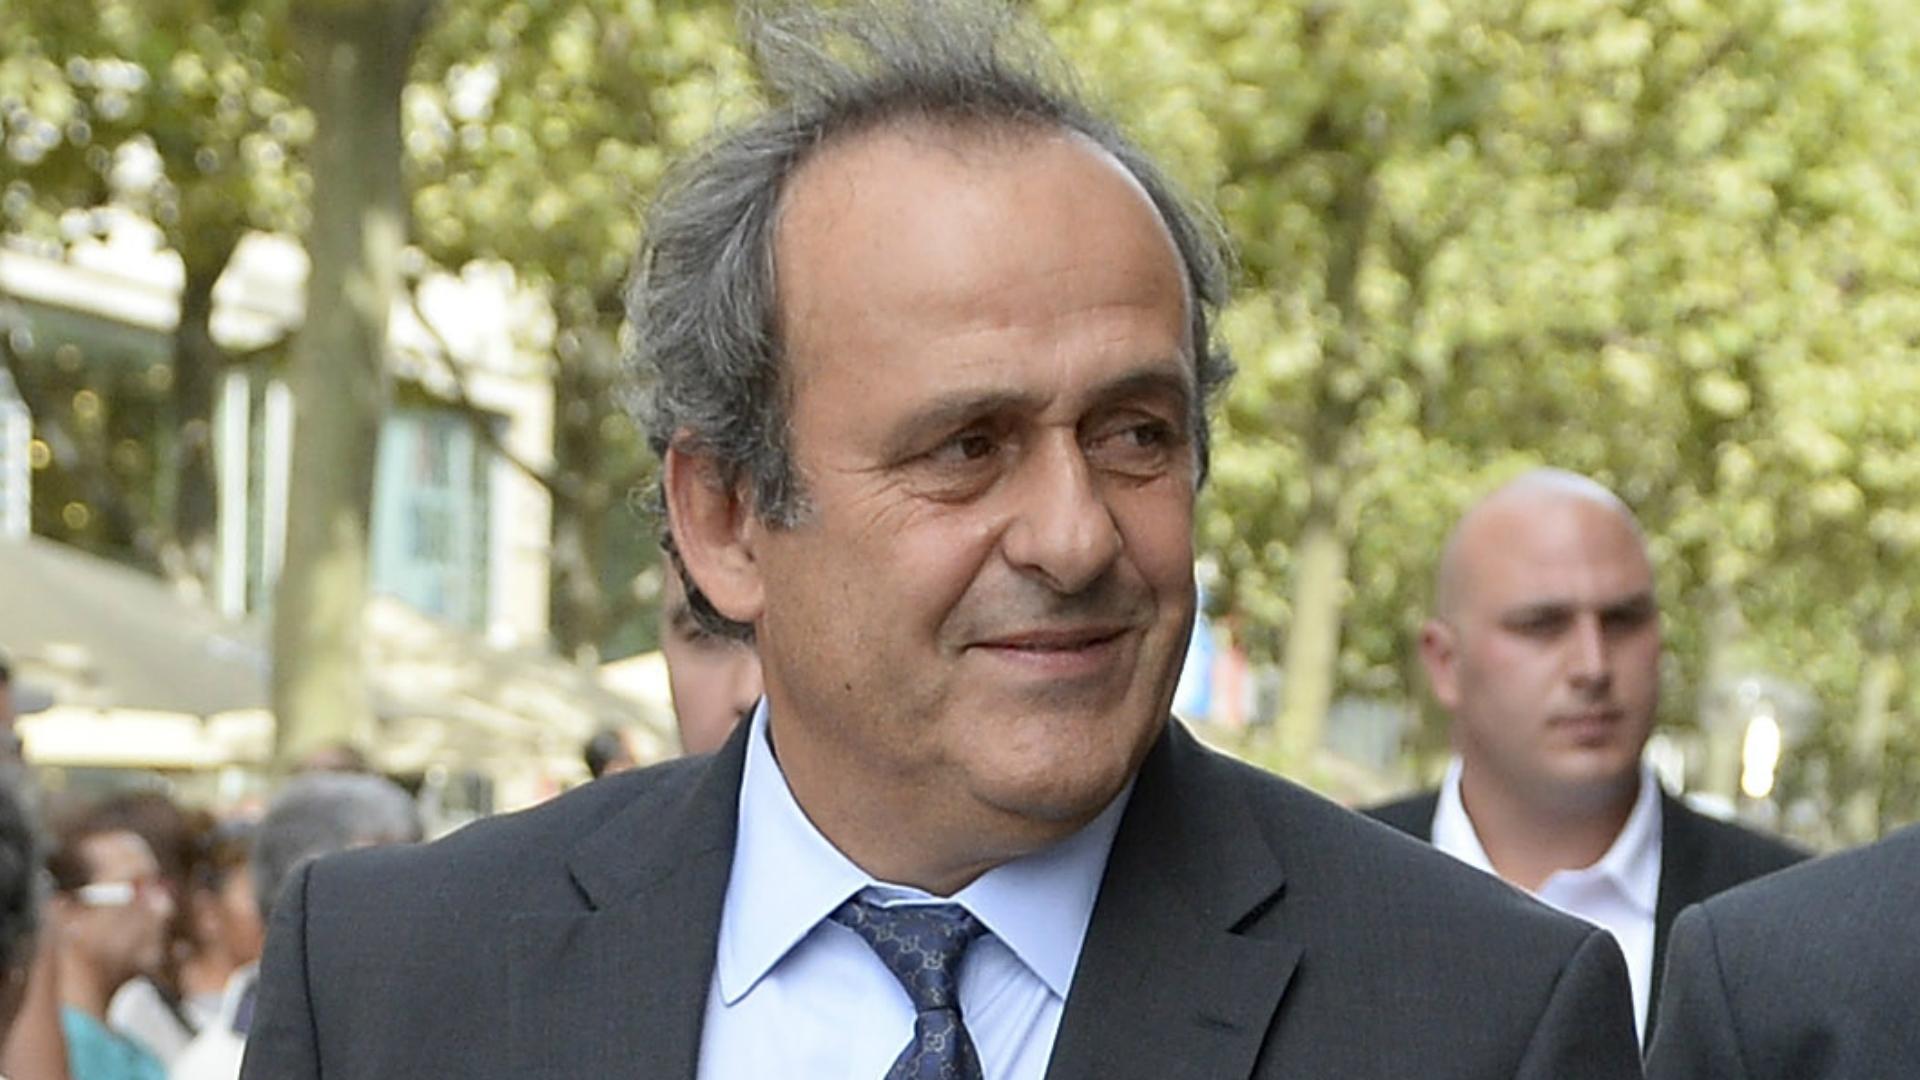 World Cup 2022: Former FIFA exec Michel Platini held in Qatar corruption probe